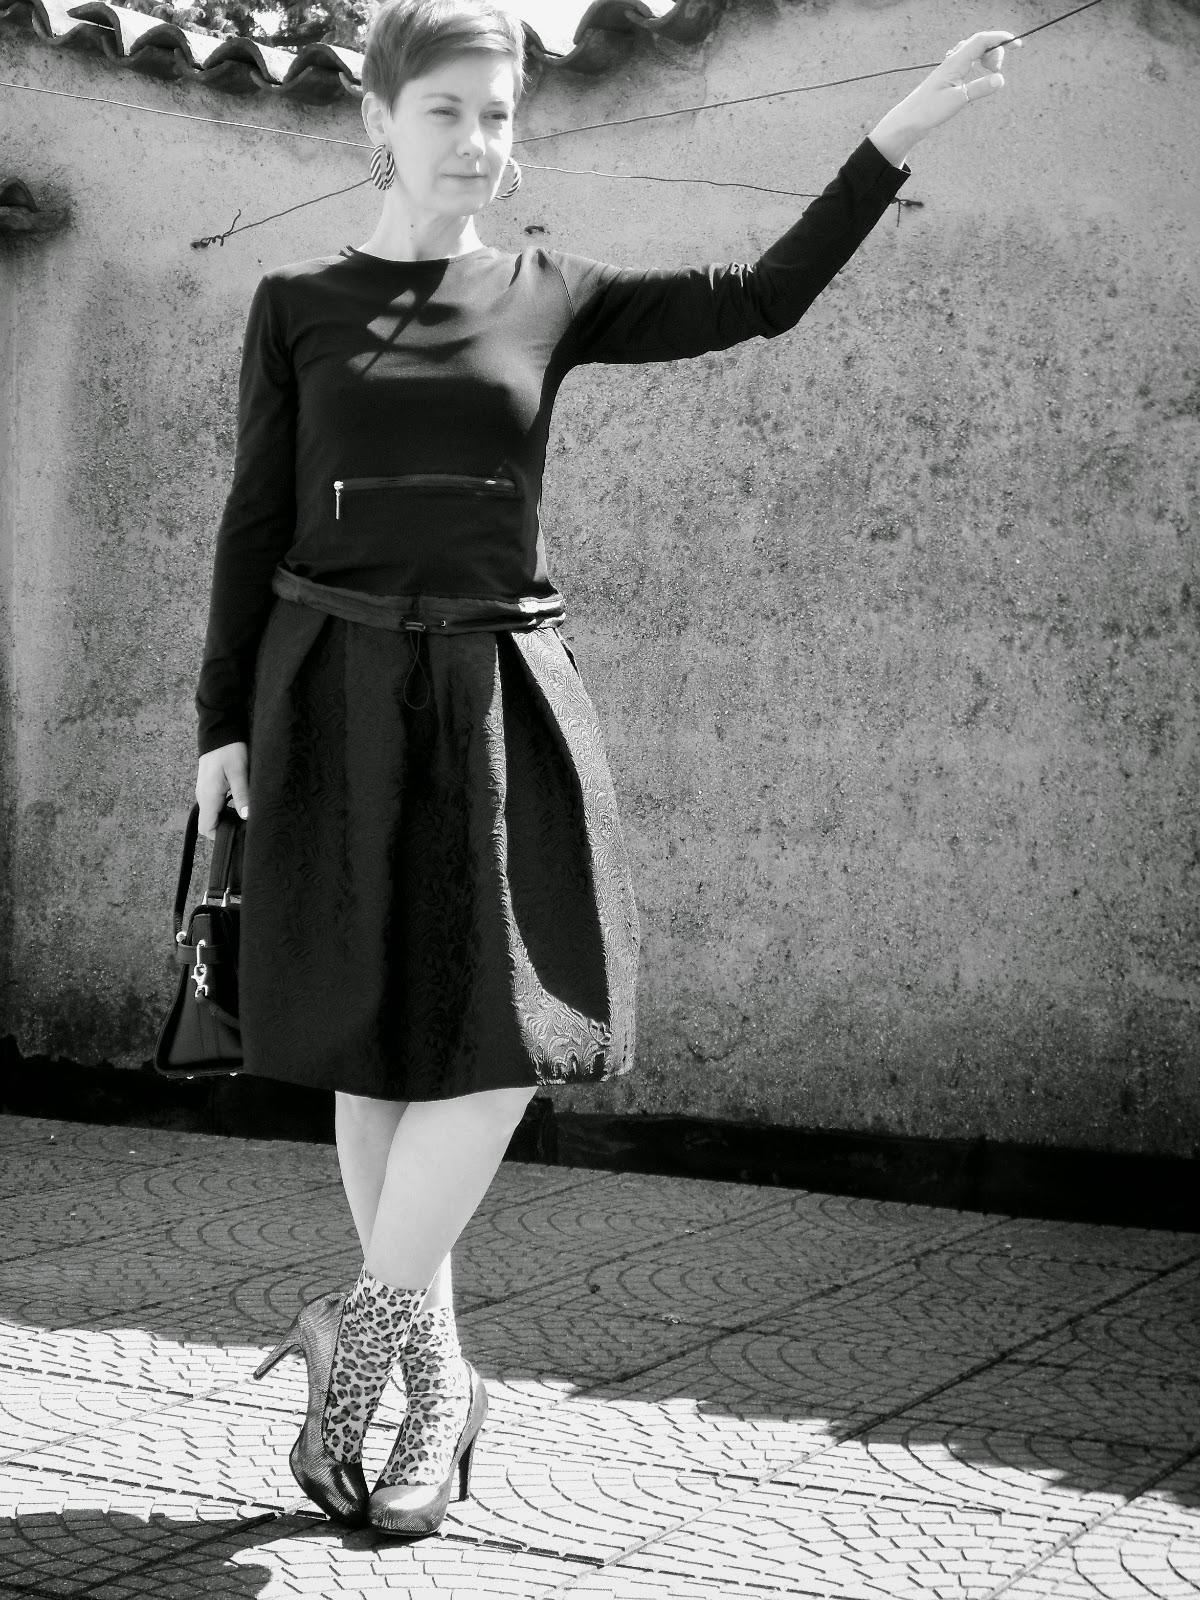 Black Midi Skirt, Black Top, Silver Heels & Leopard Socks    When Black Meets Silver - Spring Midi Skirt Love   Funky Jungle, fashion and personal style blog